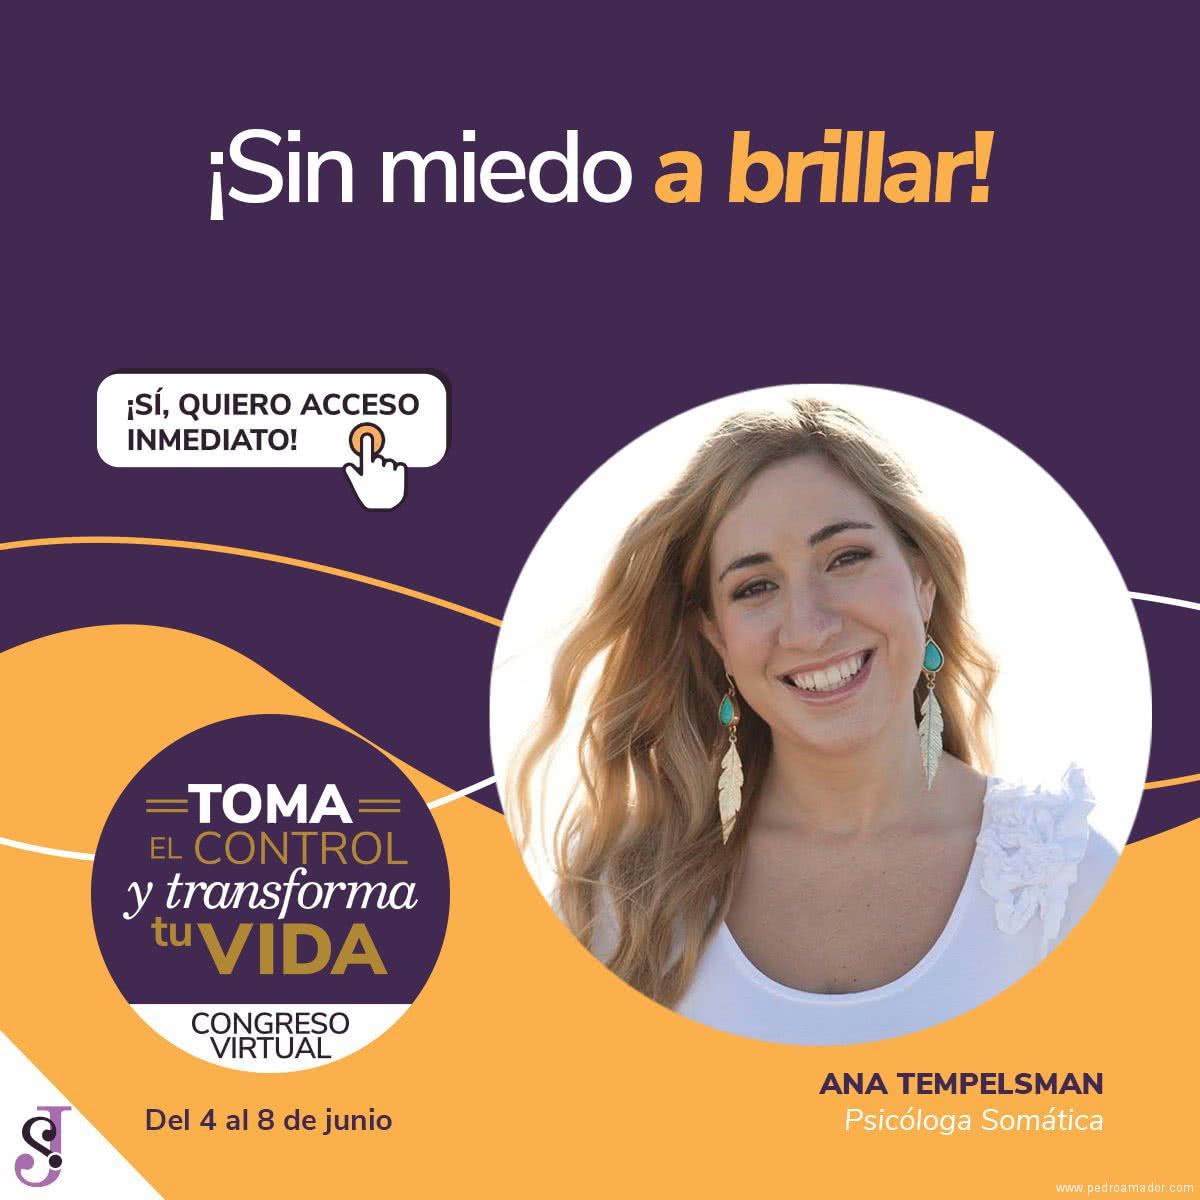 Transforma tu vida - Ana Tempelsman